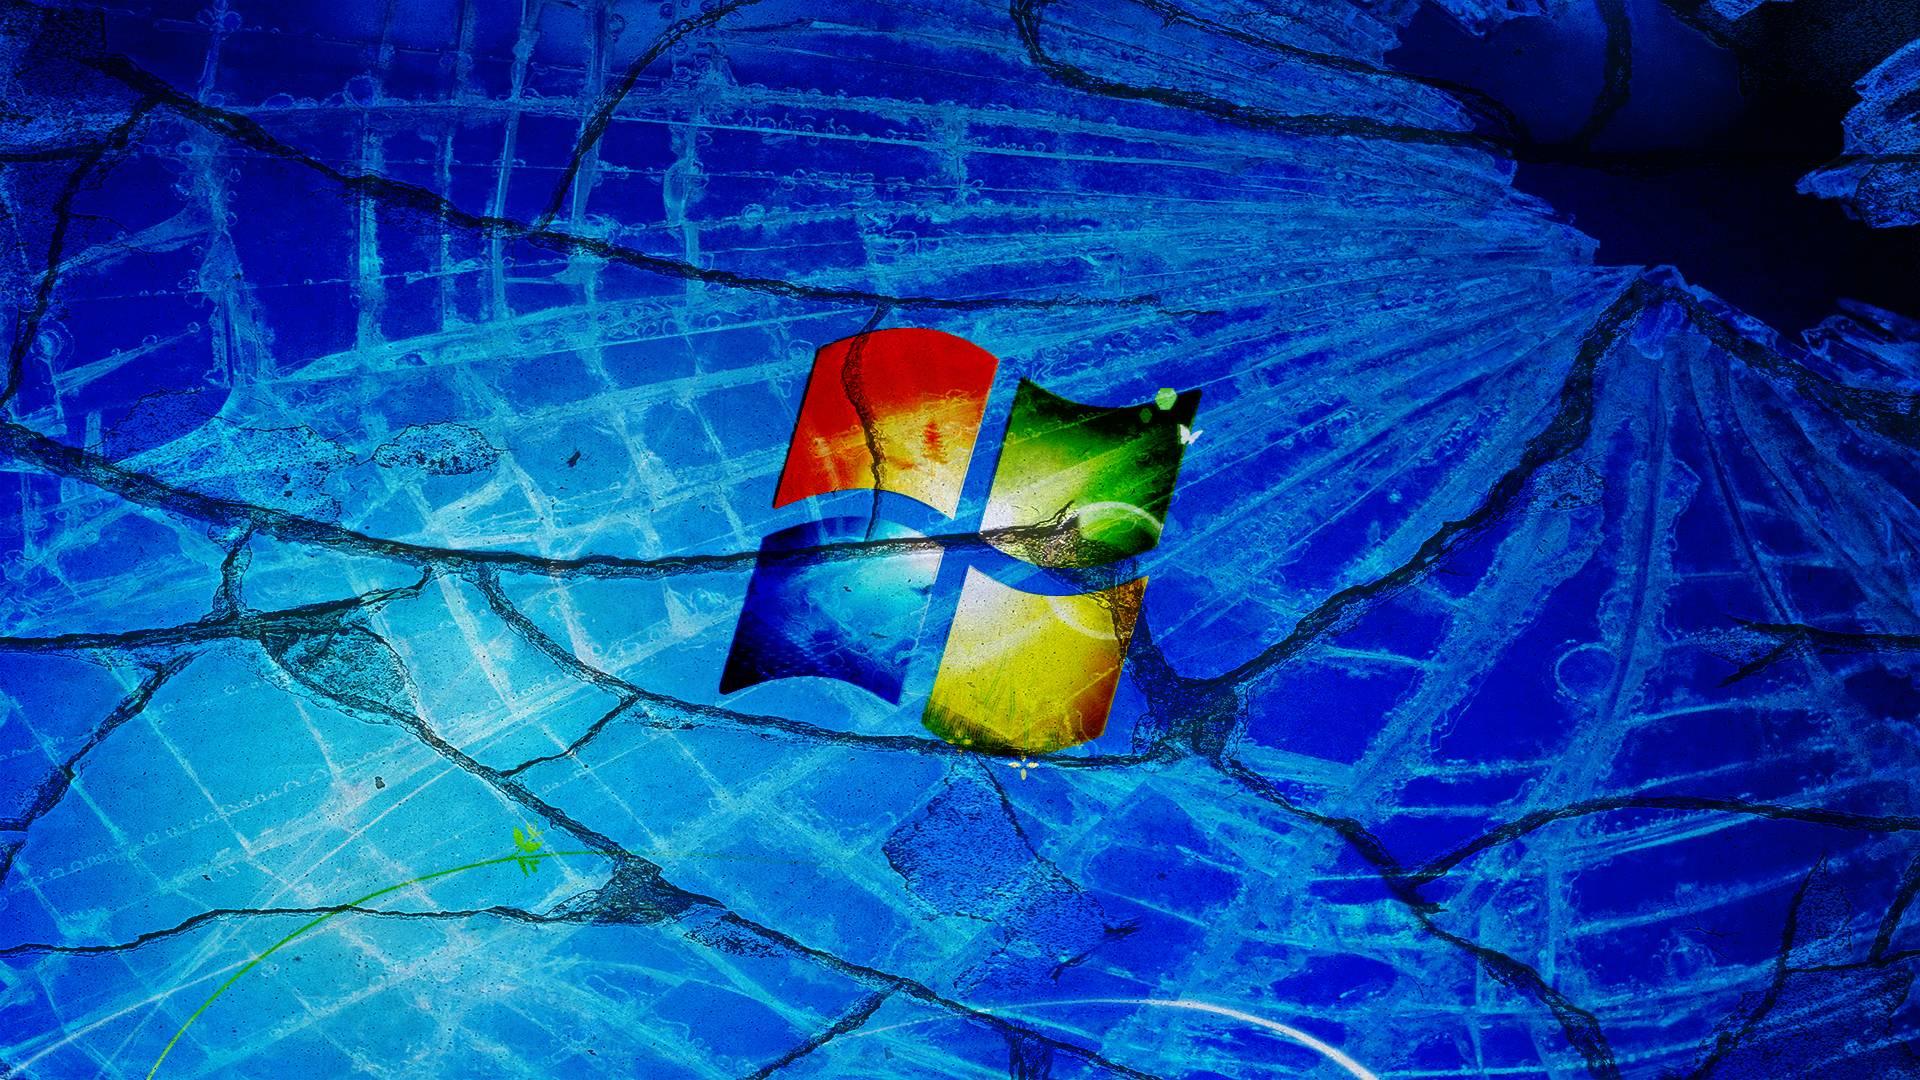 cracked computer screen wallpaper windows - photo #14